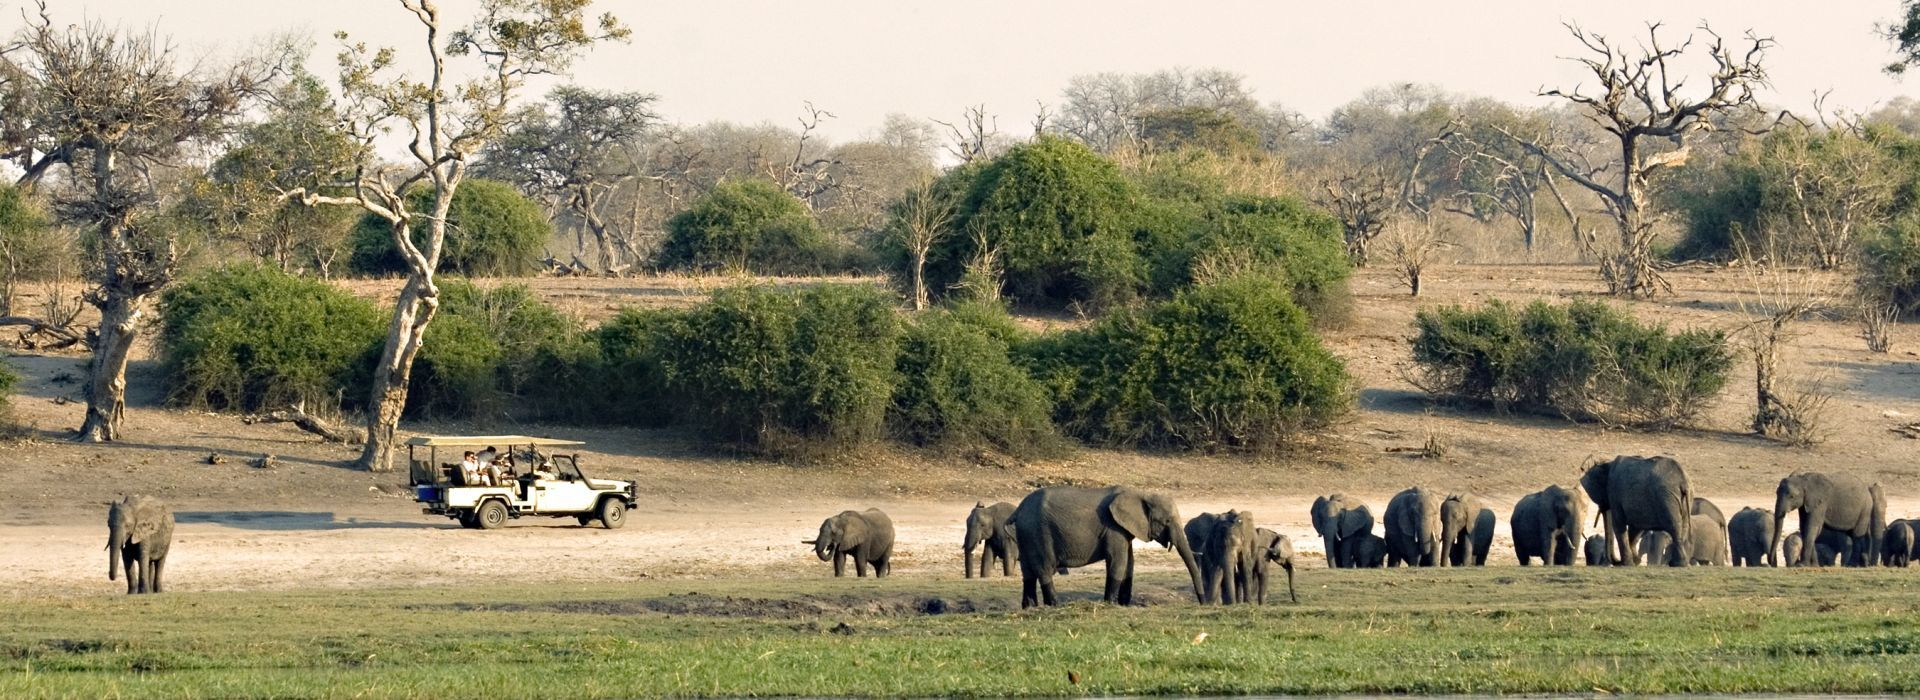 Adventure Tours in Botswana